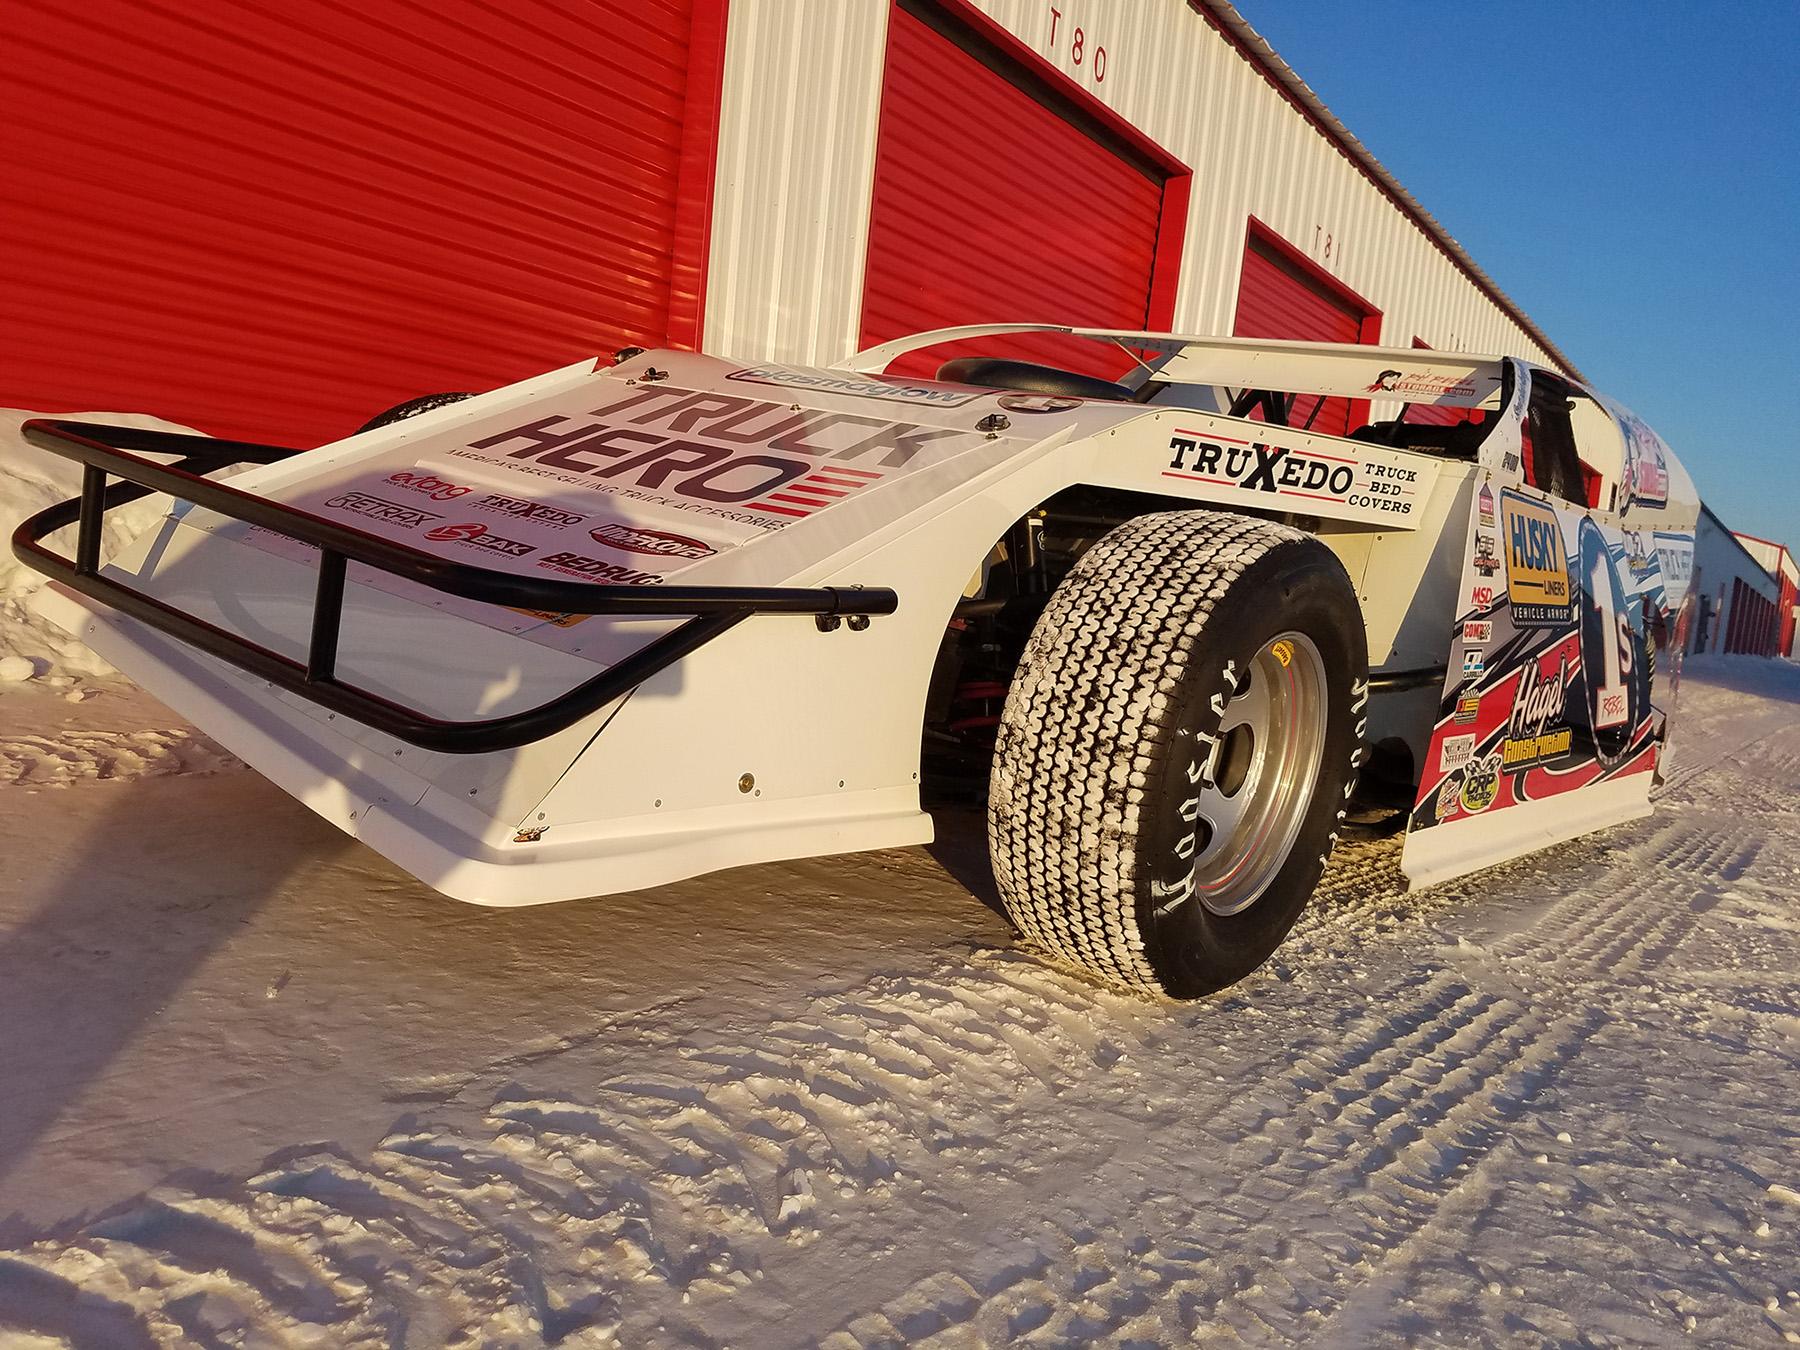 Truck Hero, Dakota Engines #1s Race Car